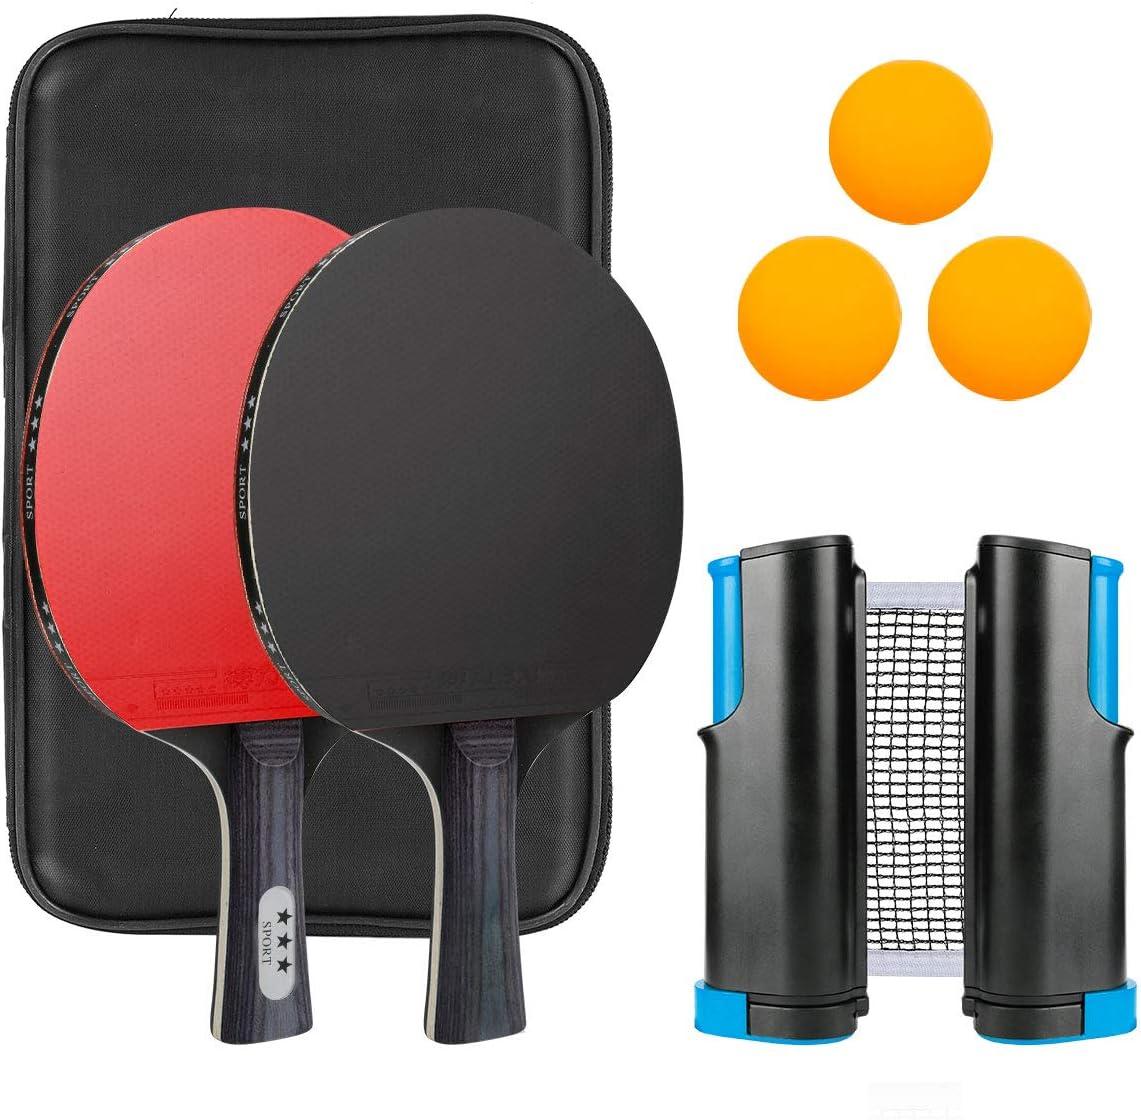 BestFire Ping Pong Paddle, Ping Pong Paddles Set of 2 Pro Ping P